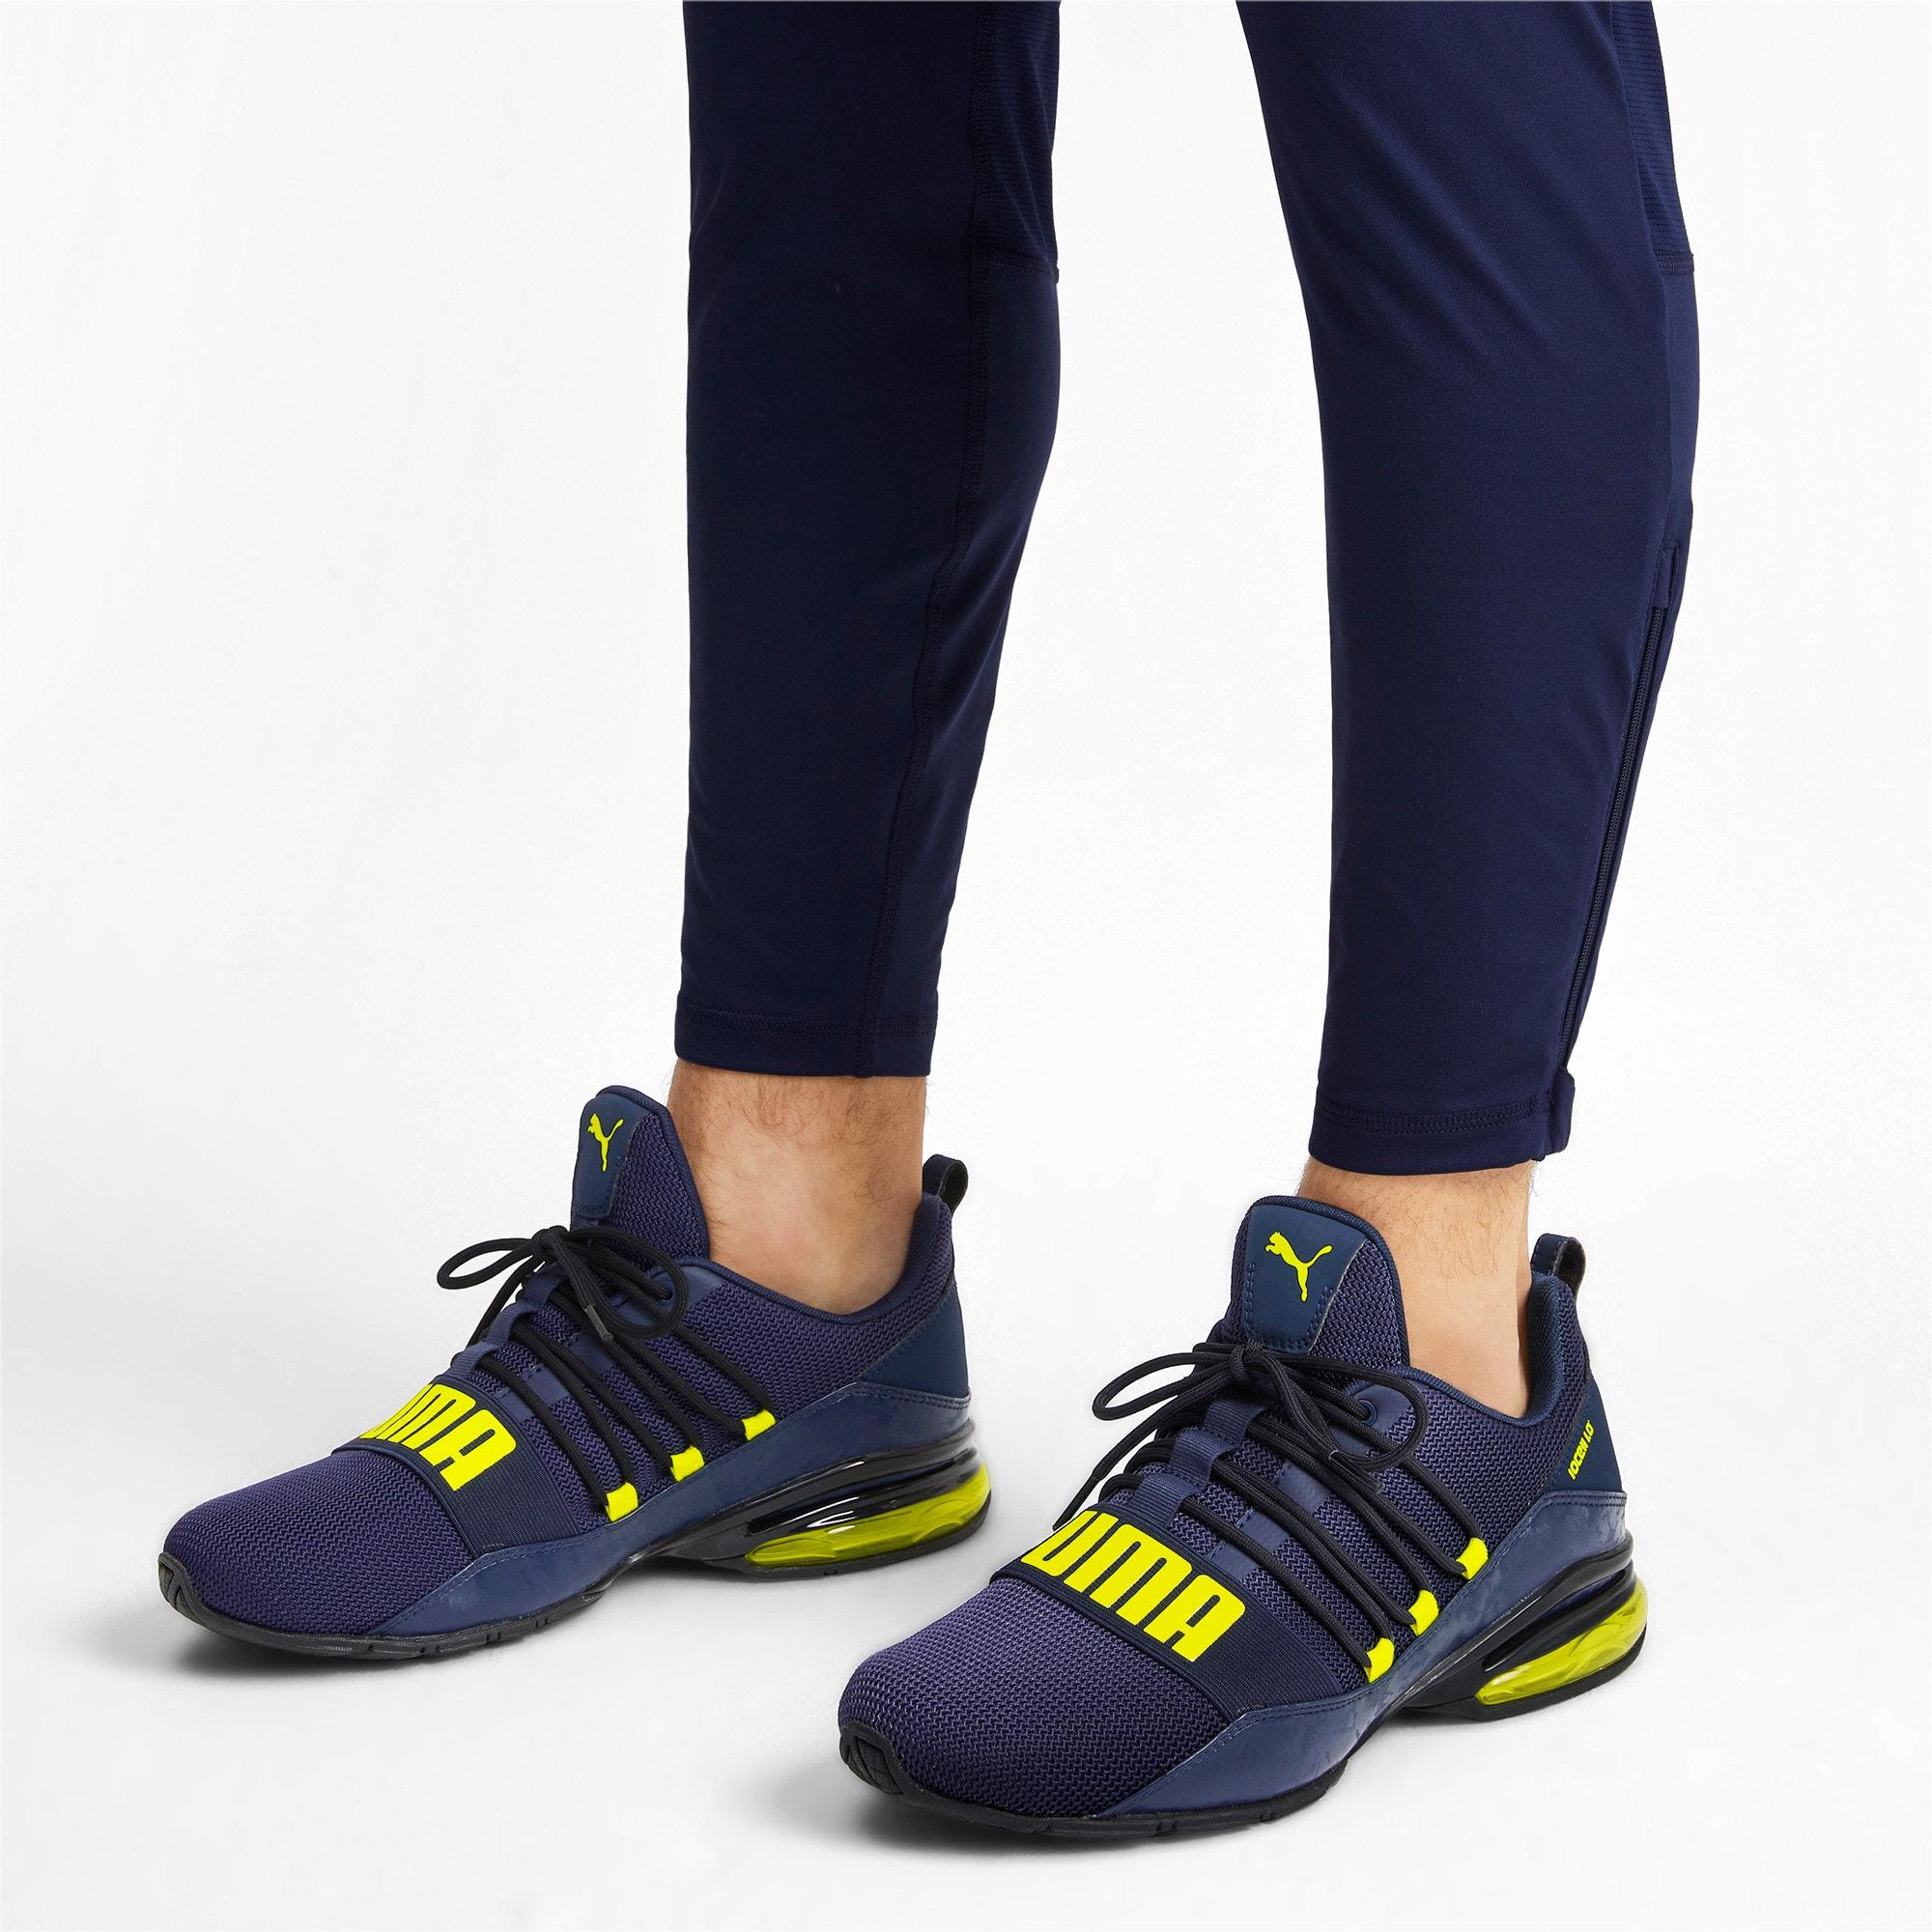 Thumbnail 2 of CELL Regulate Camo Men's Training Shoes, Peacoat-Yellow Alert, medium